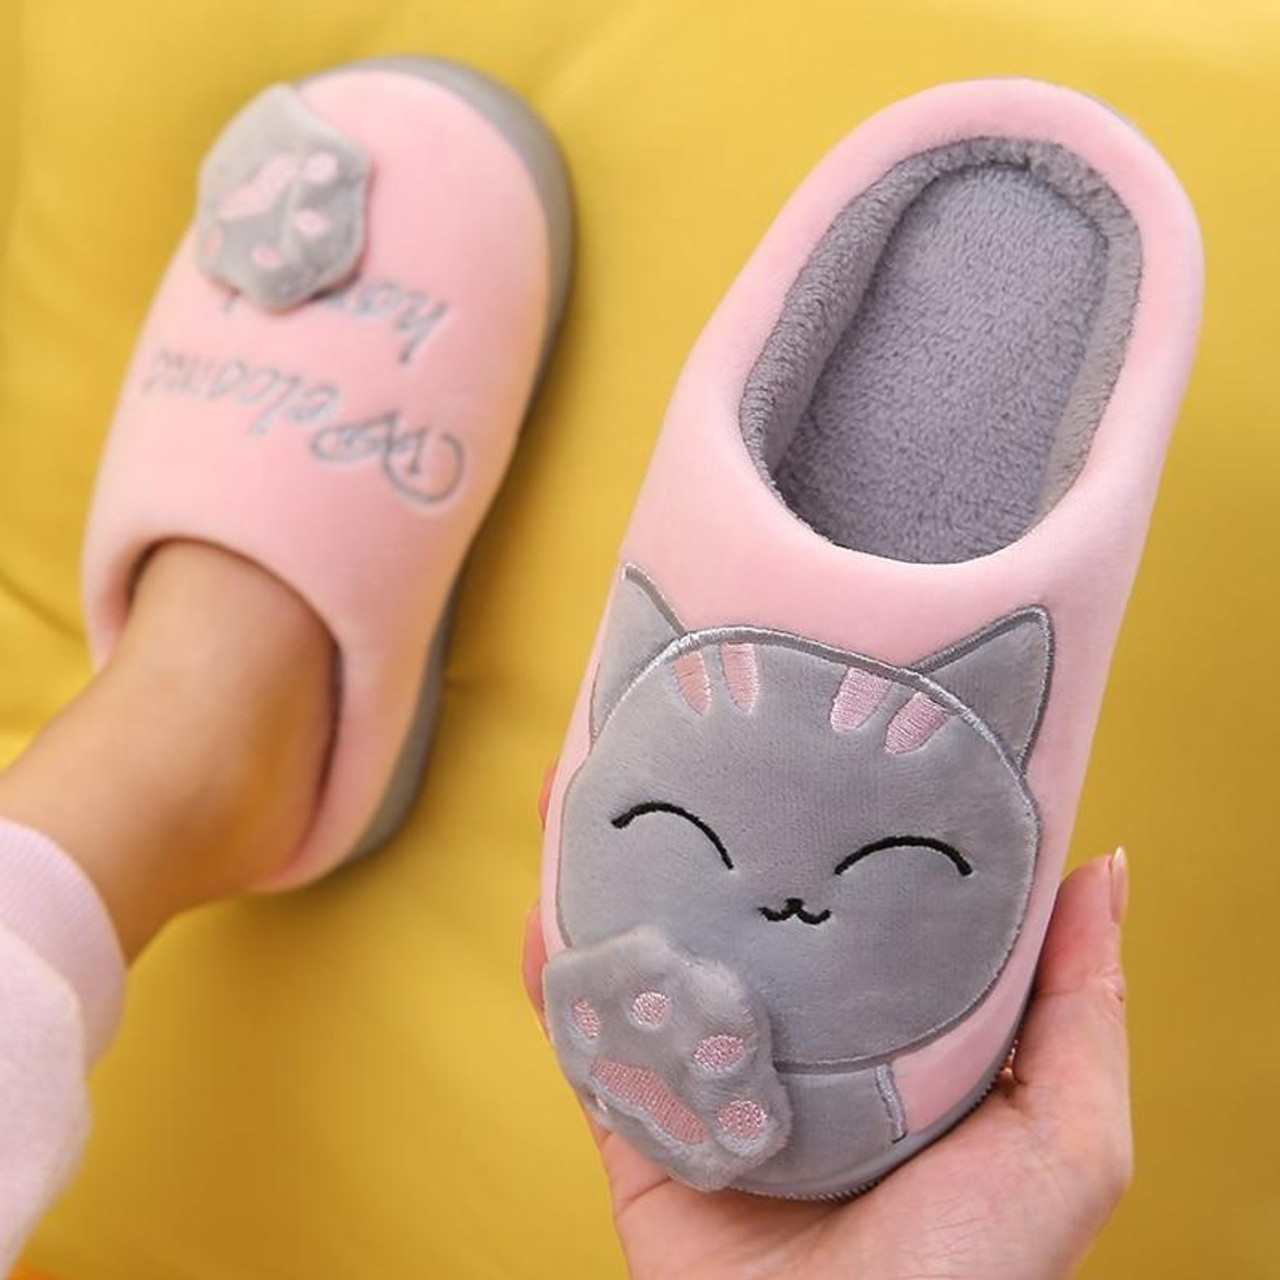 Boys Cartoon Slippers Kids Toddler  Winter Warm Anti-slip Indoor Shoes 1-6Y